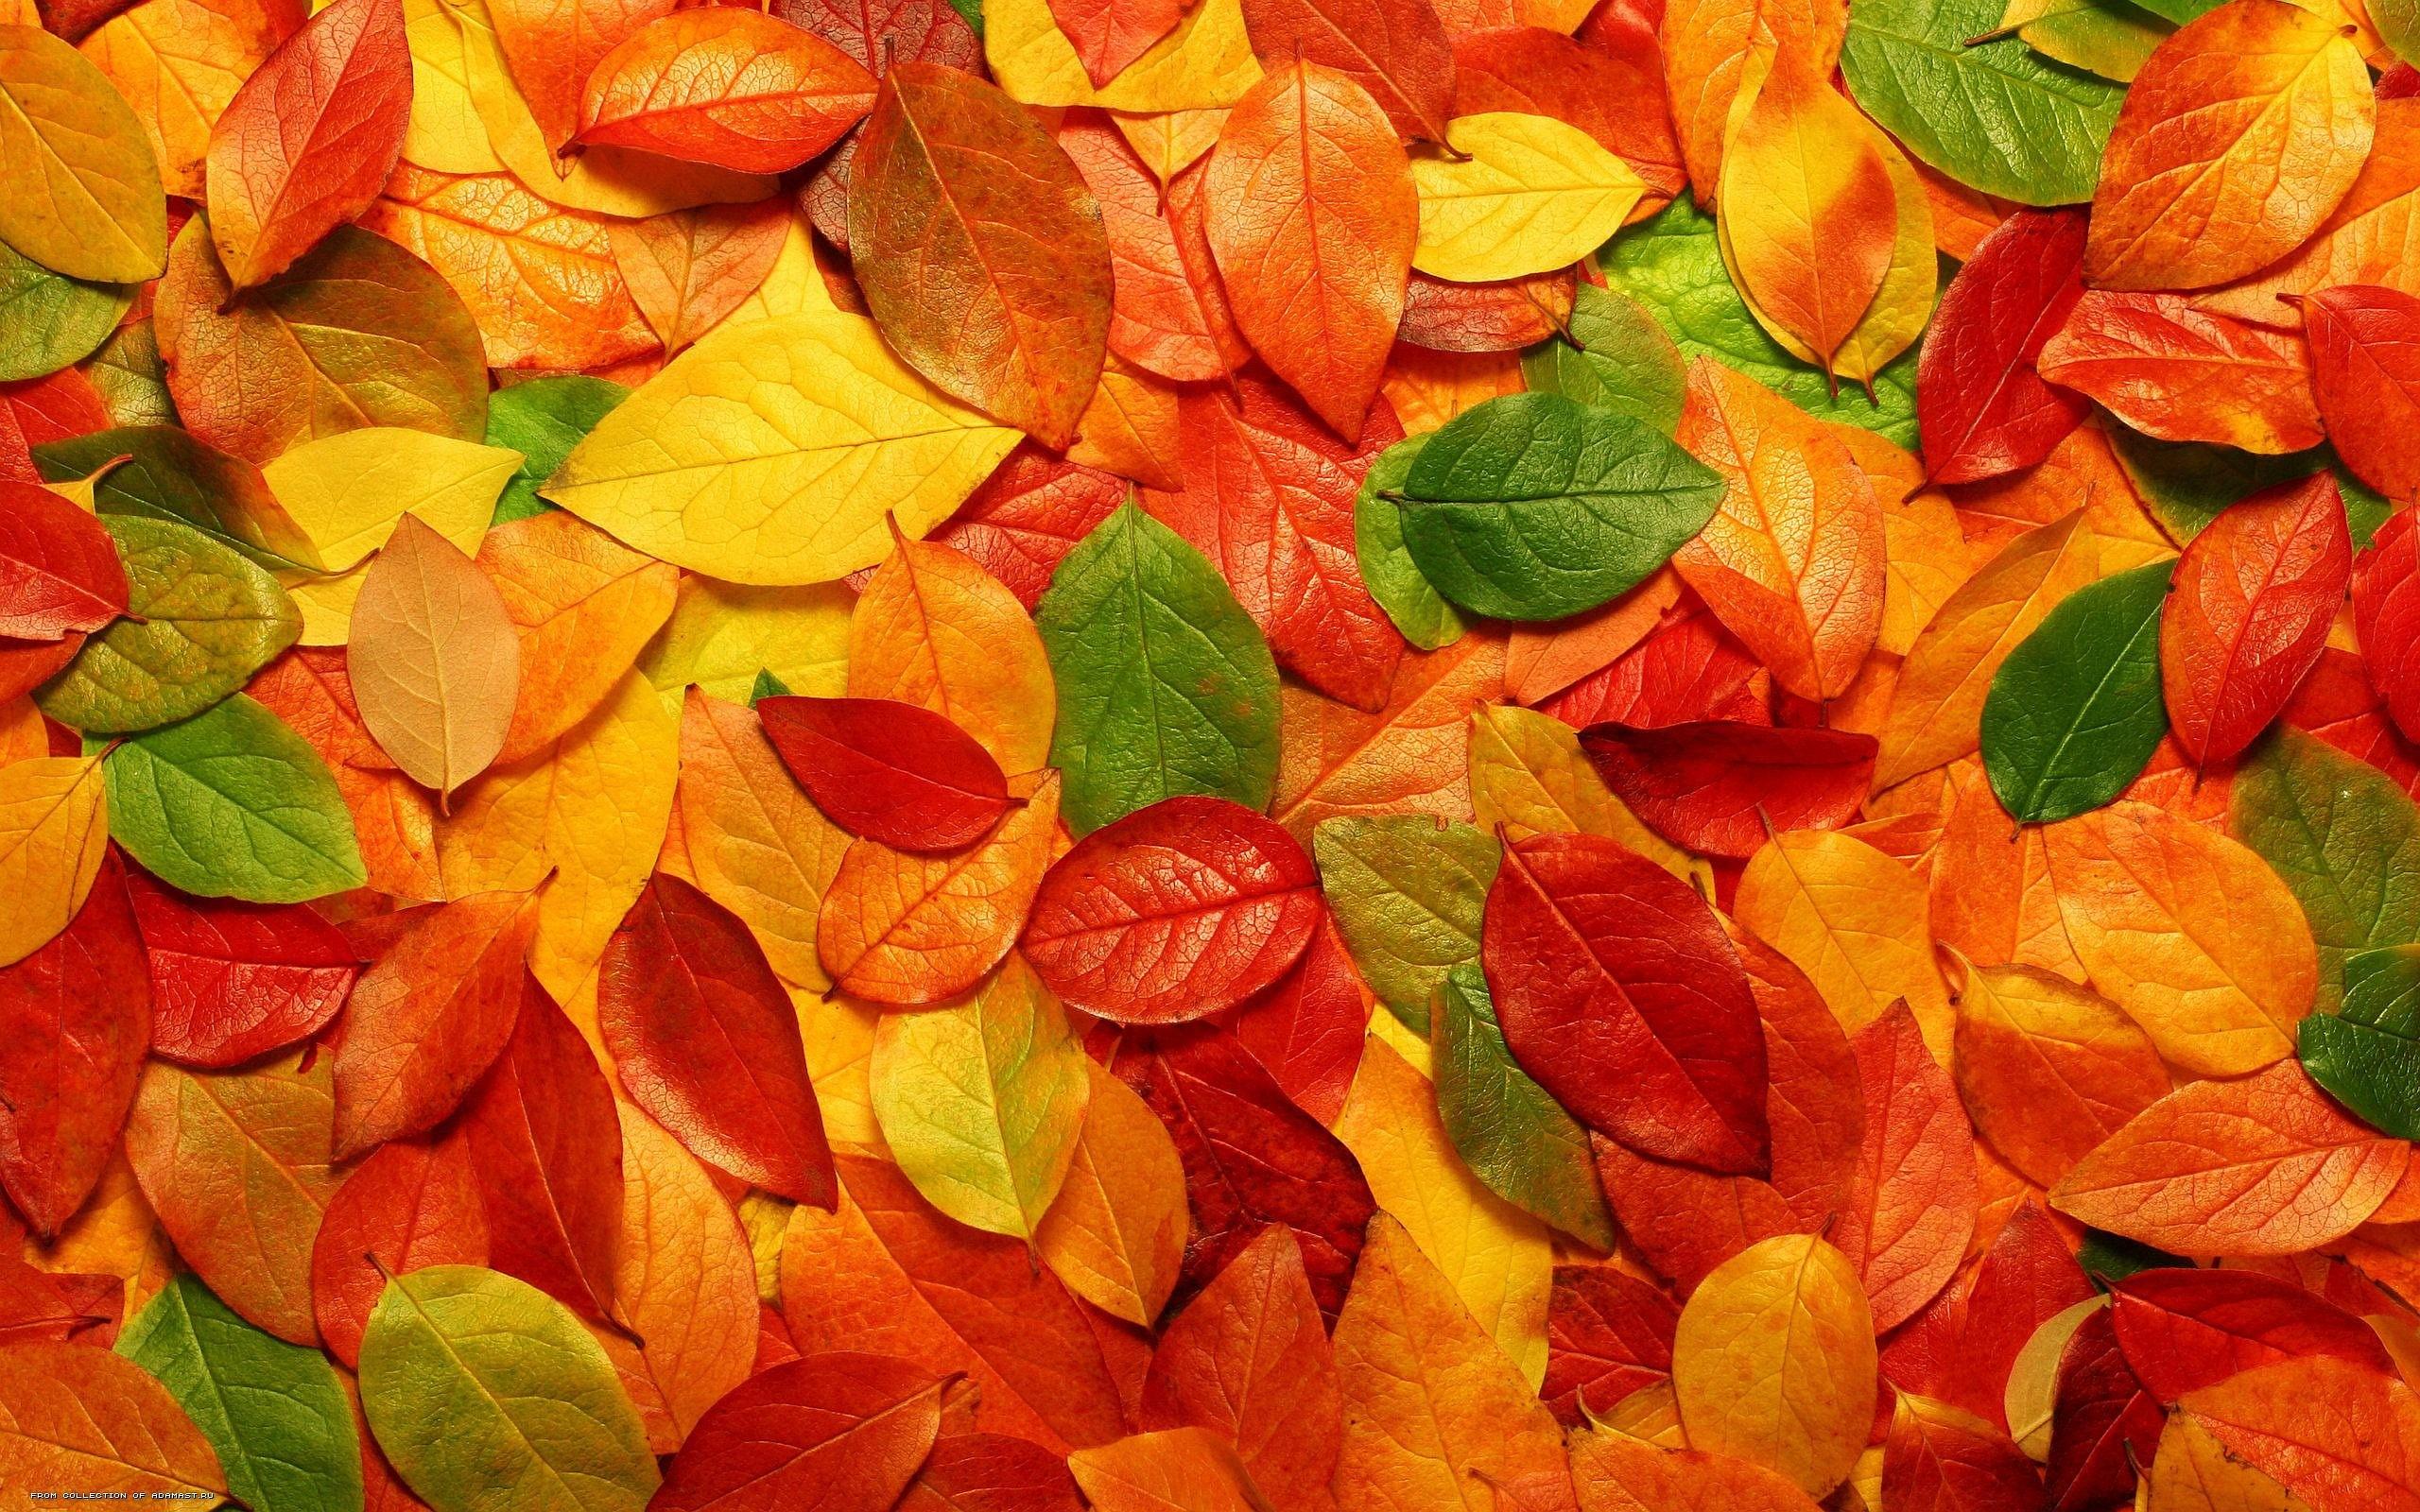 Fall Leaves Tumblr Background Autumn Leaves #8221